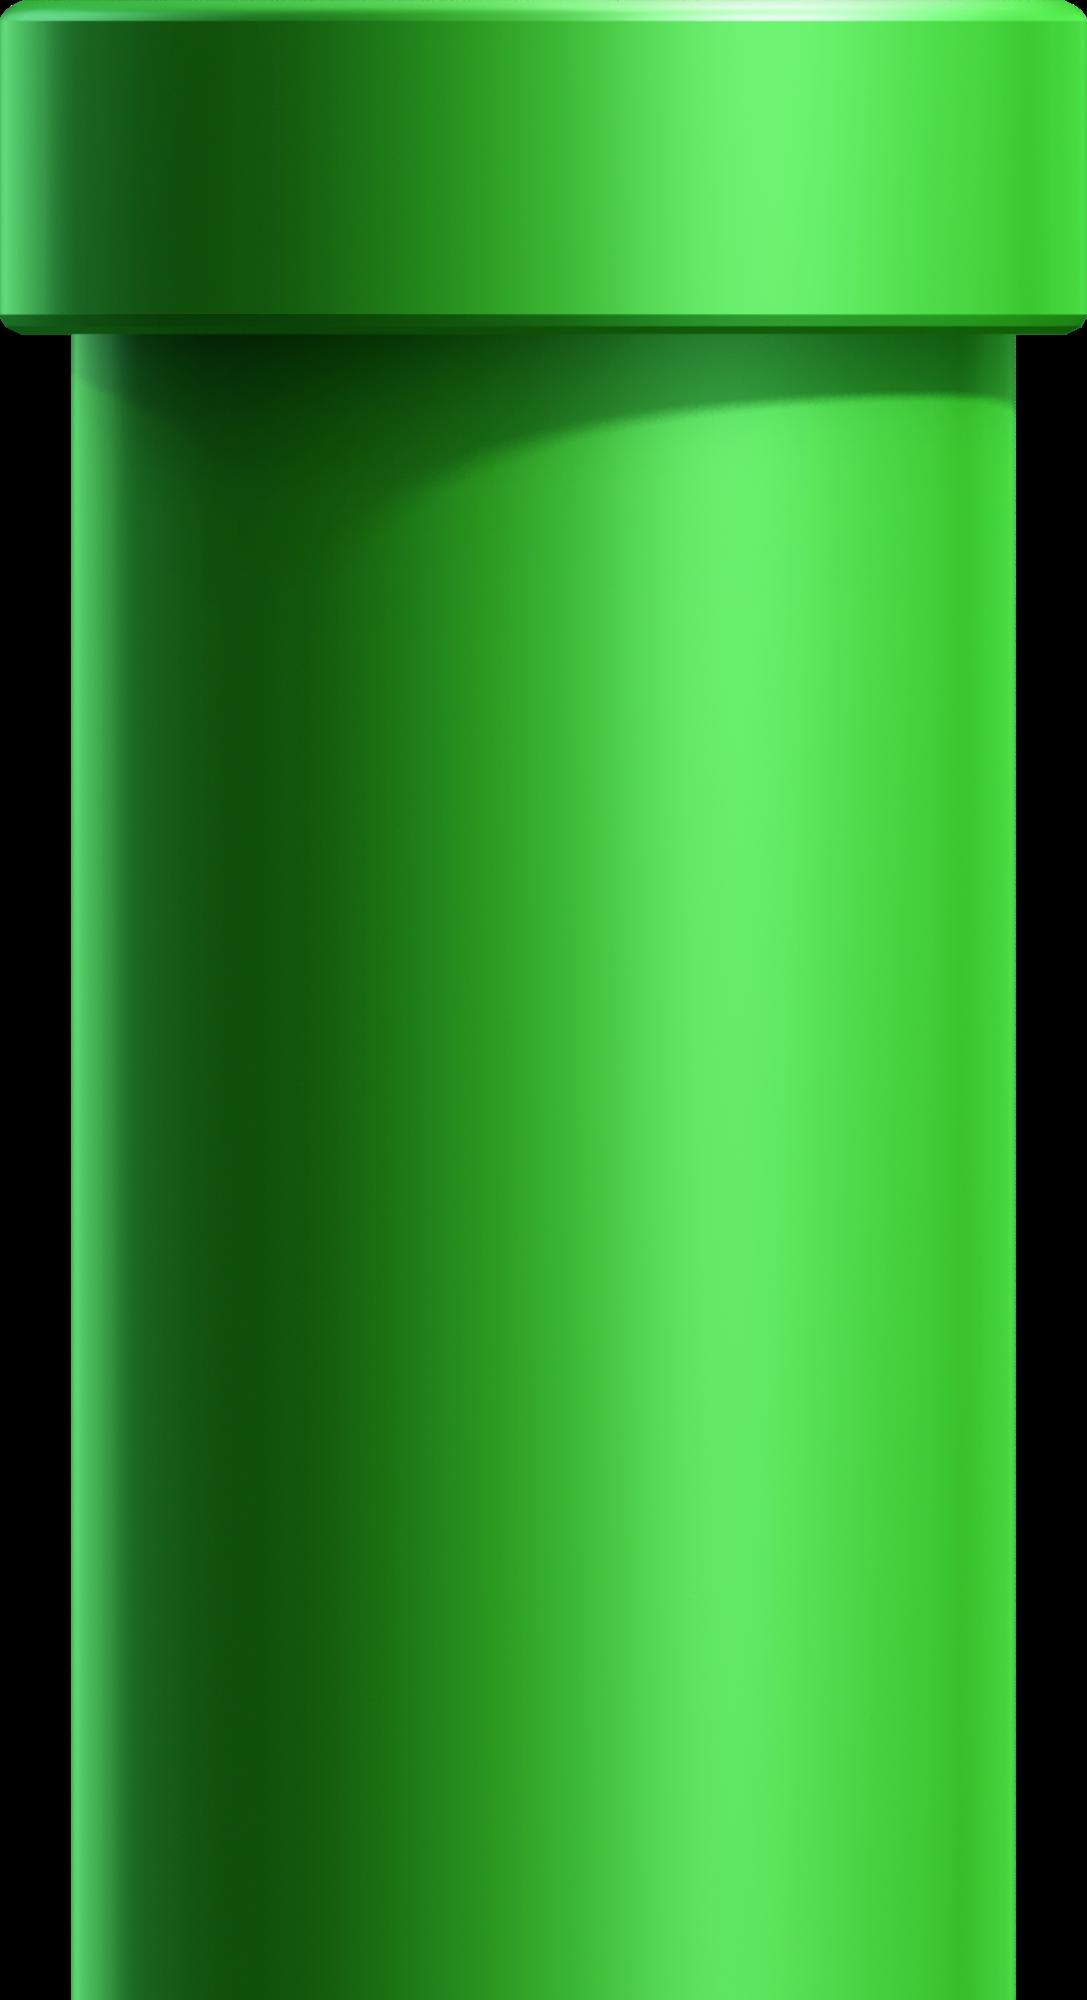 Image Green Warp Pipe Nsmbu Png Fantendo Nintendo